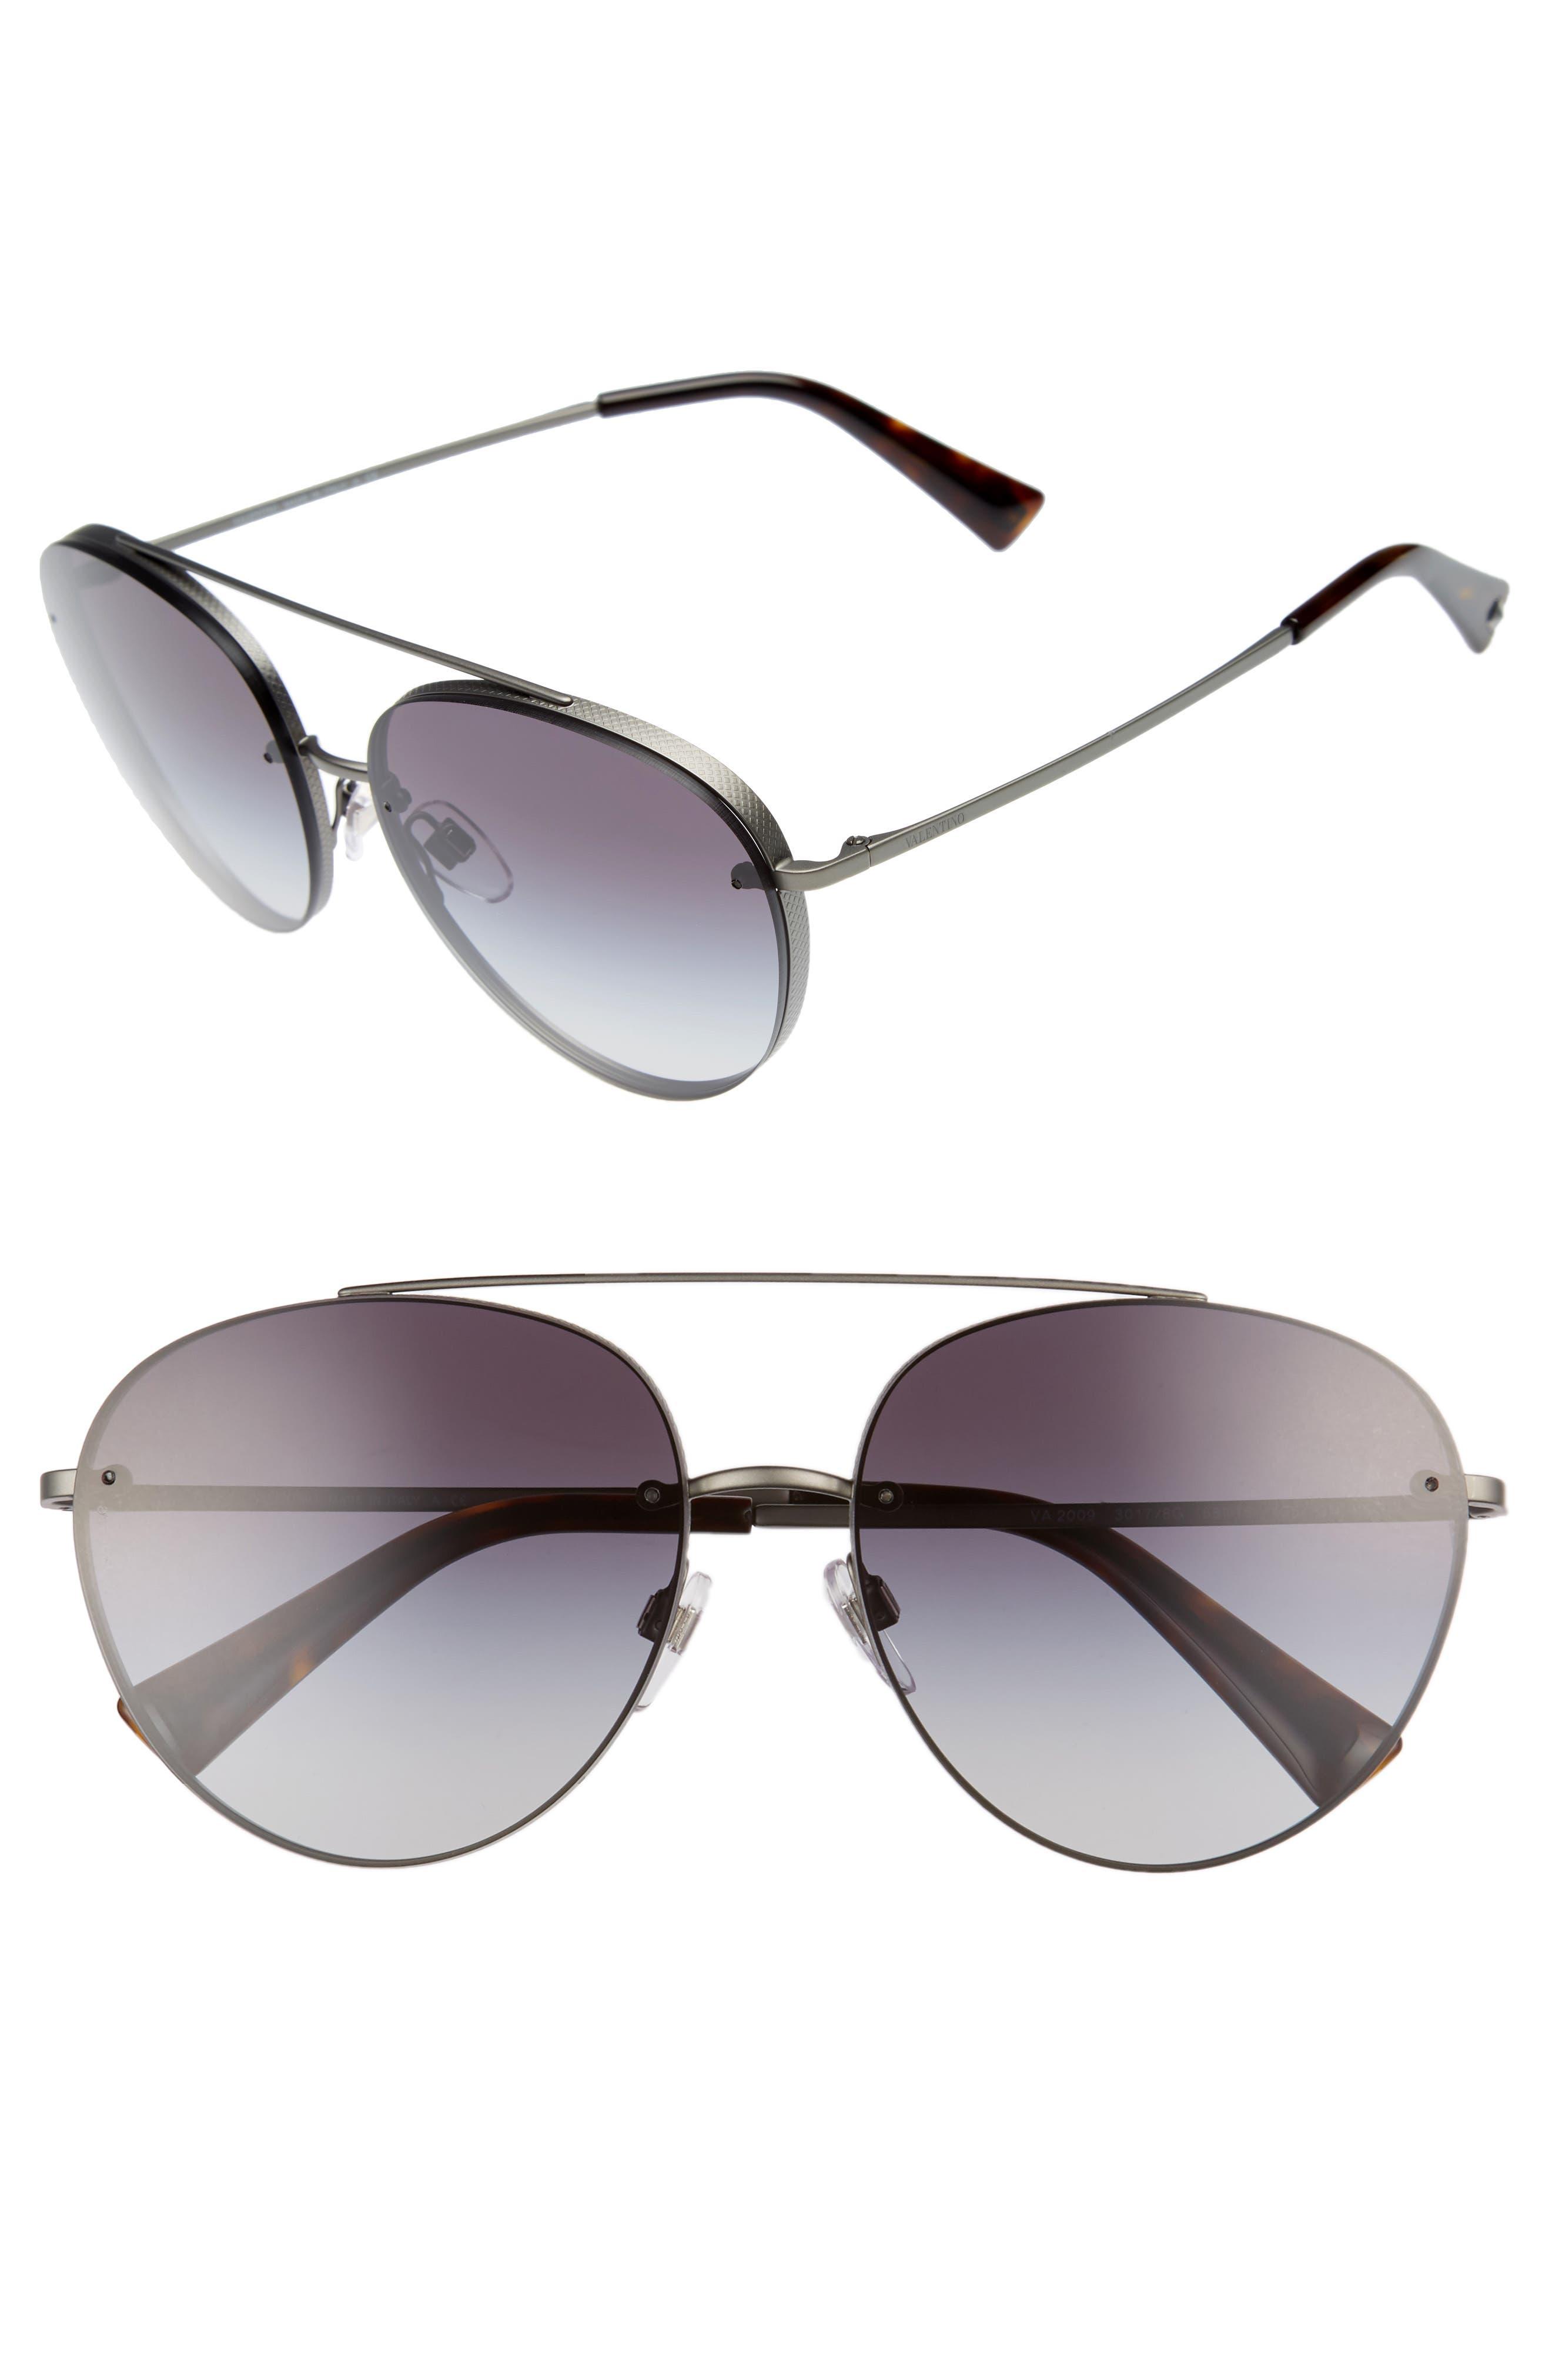 58mm Gradient Aviator Sunglasses,                             Main thumbnail 1, color,                             021